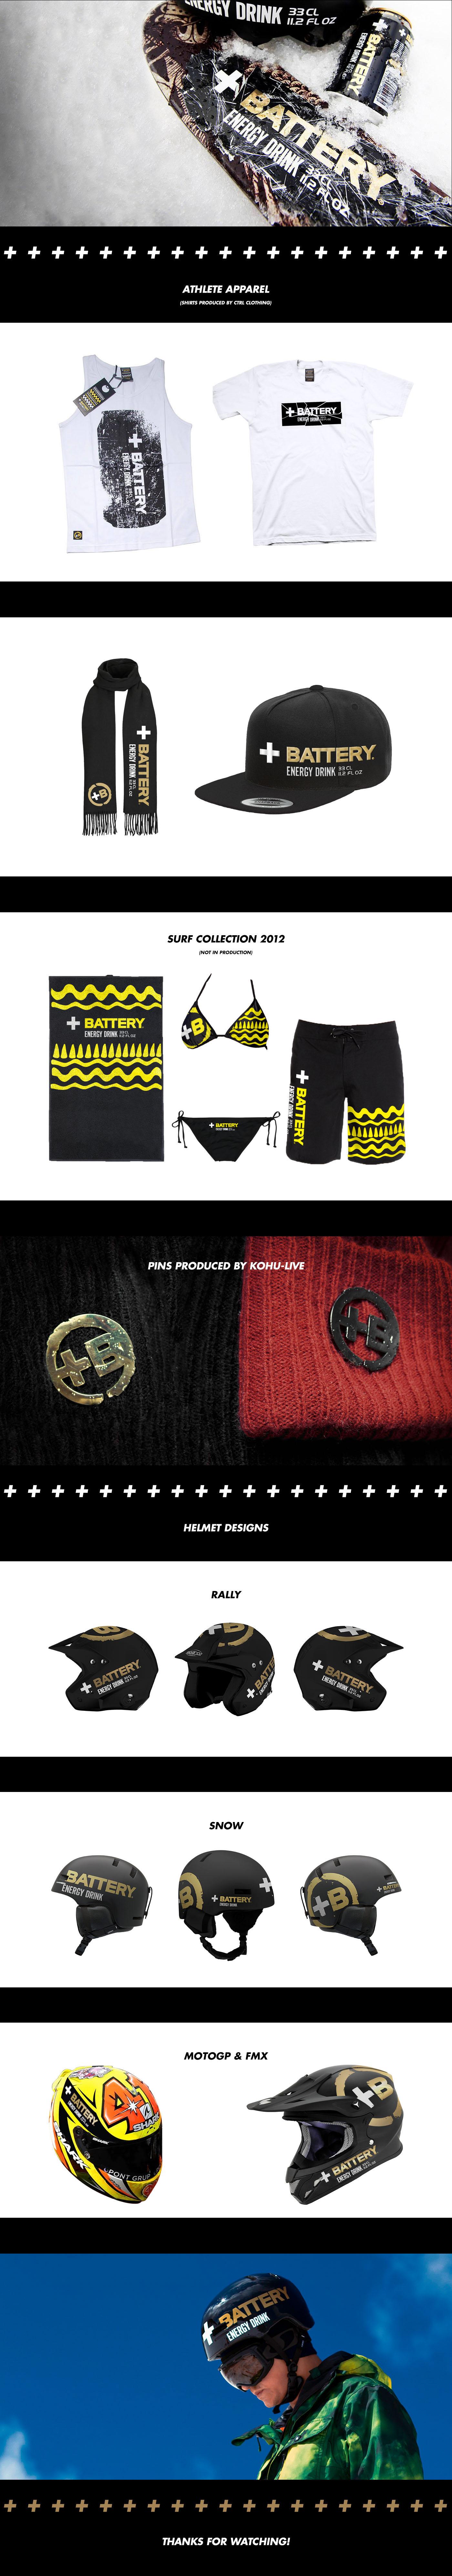 energy drink Helmet Surf Snowboarding Motocross freestyle sport apparel black gold